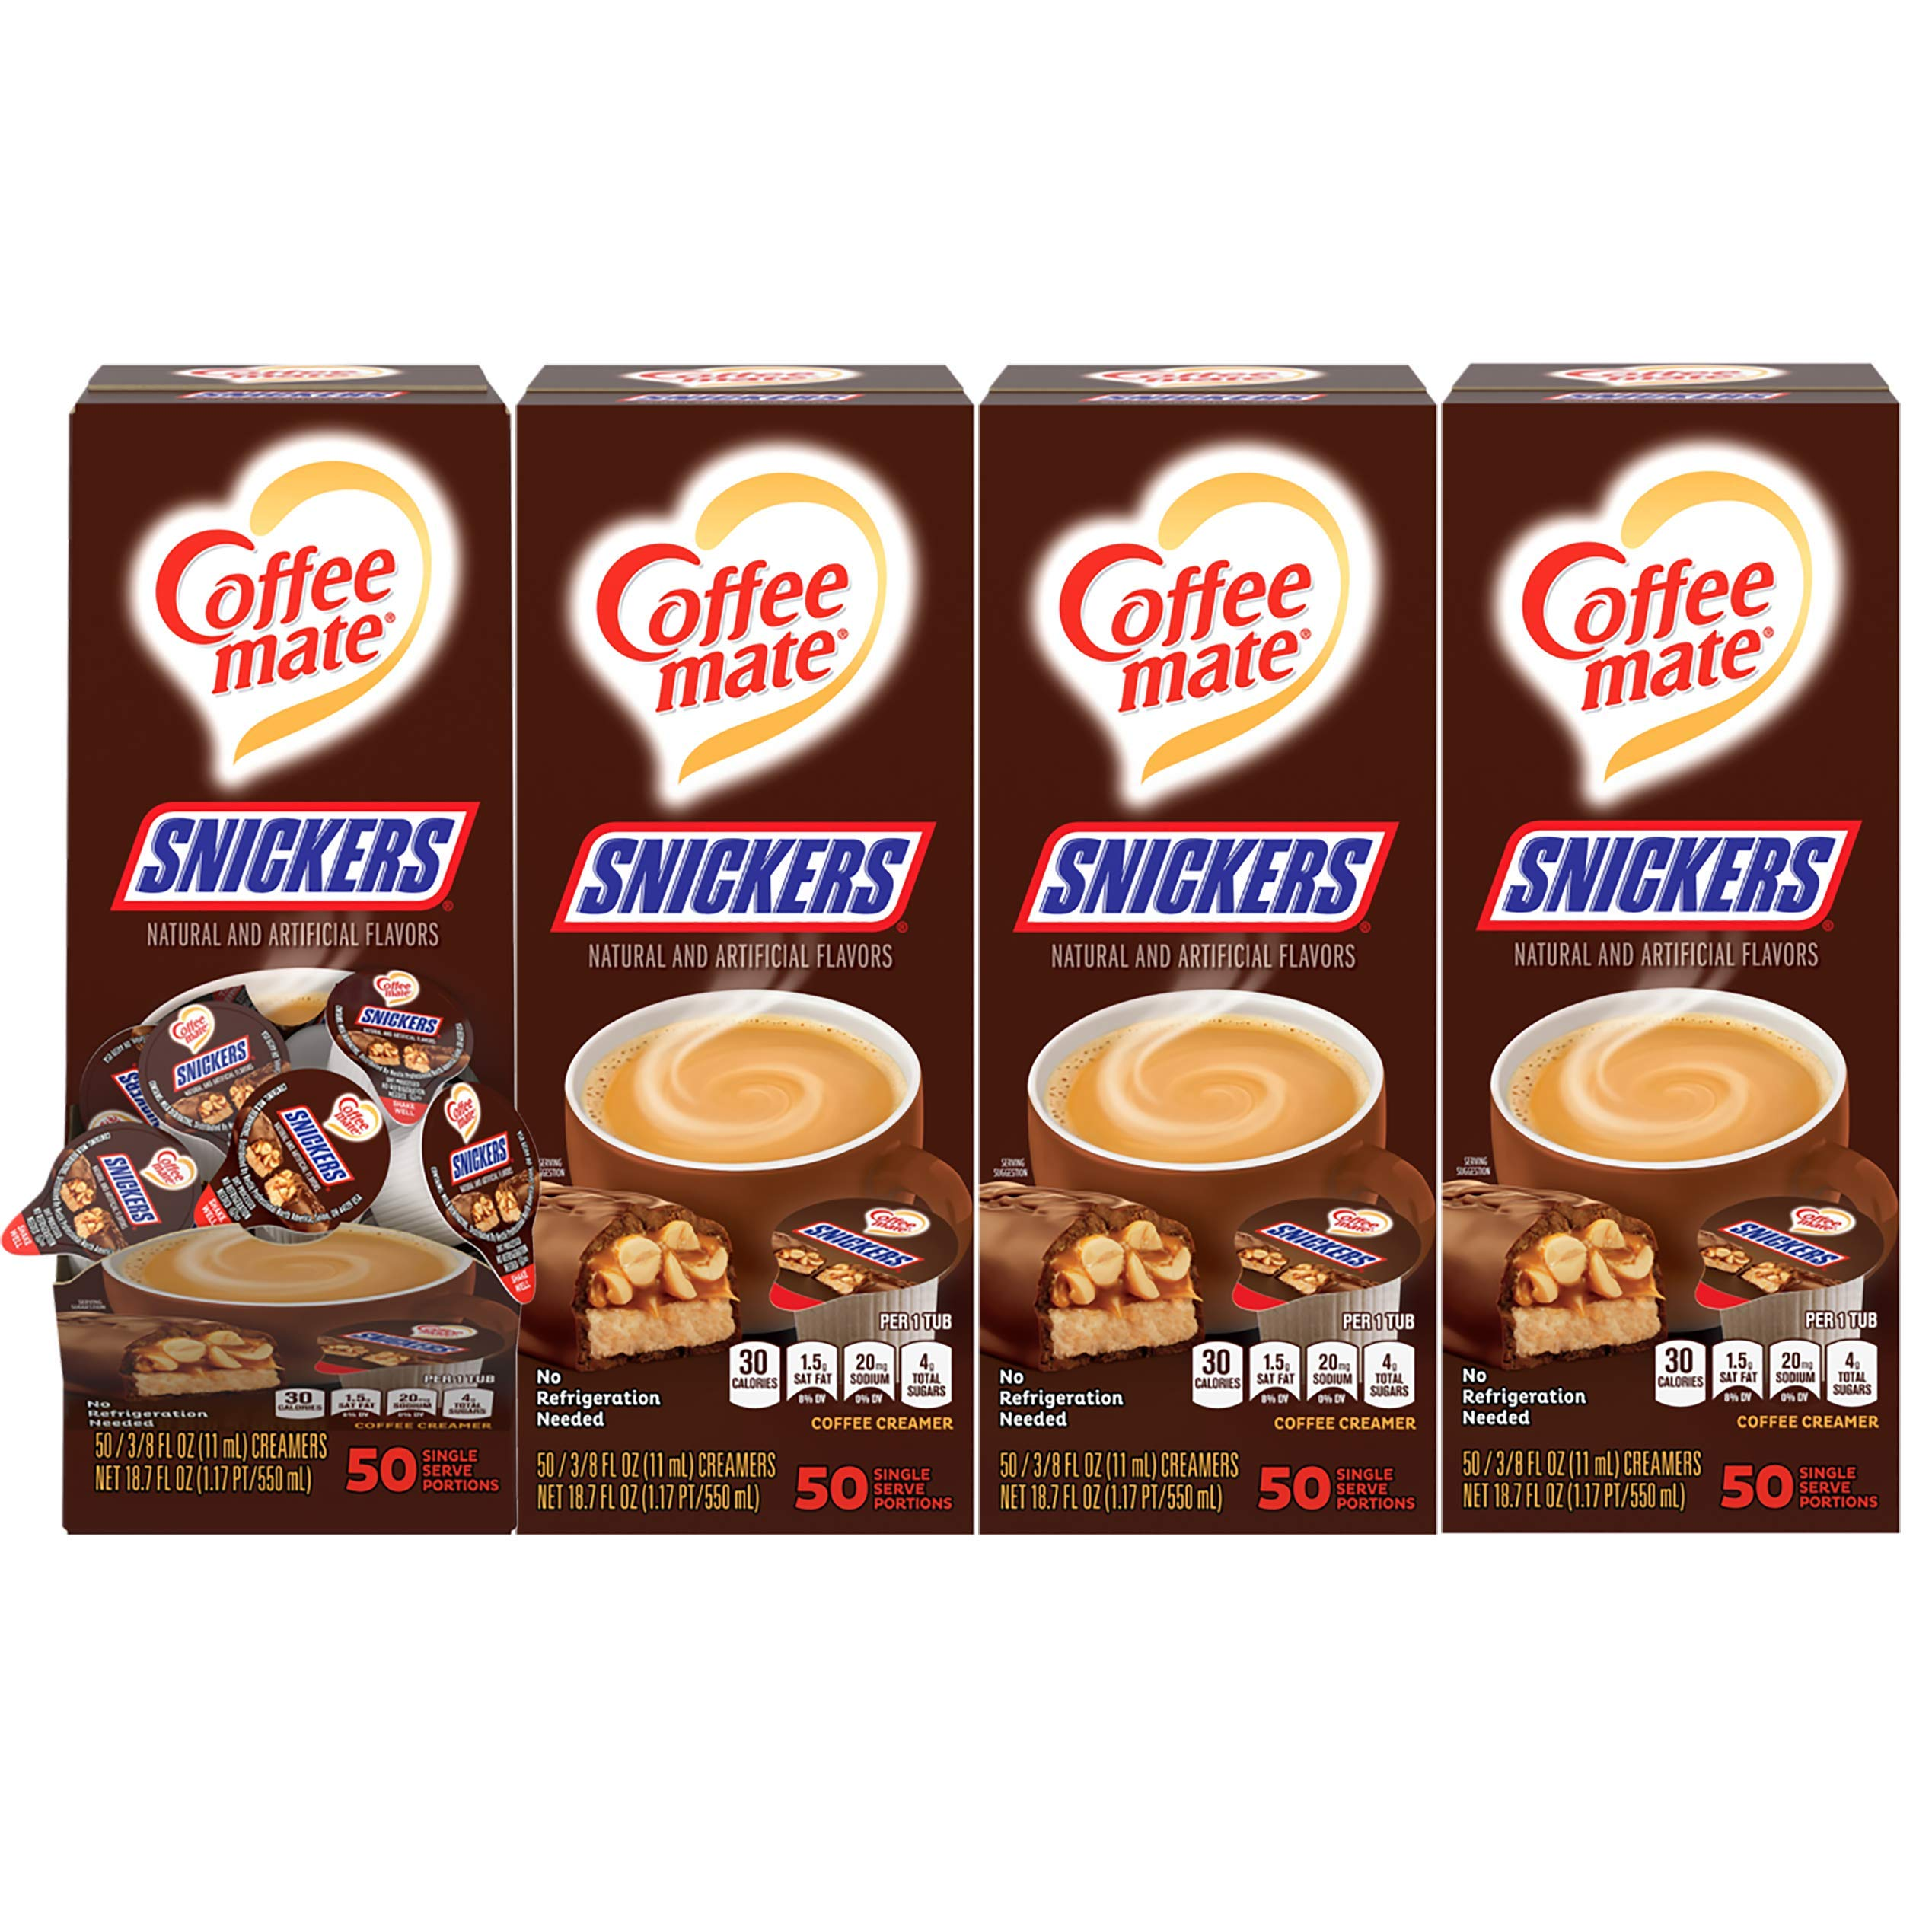 Nestle Coffee mate Coffee Creamer, Snickers, Liquid Creamer Singles, Non Dairy, No Refrigeration, Box of 50 Singles (Pack of 4)